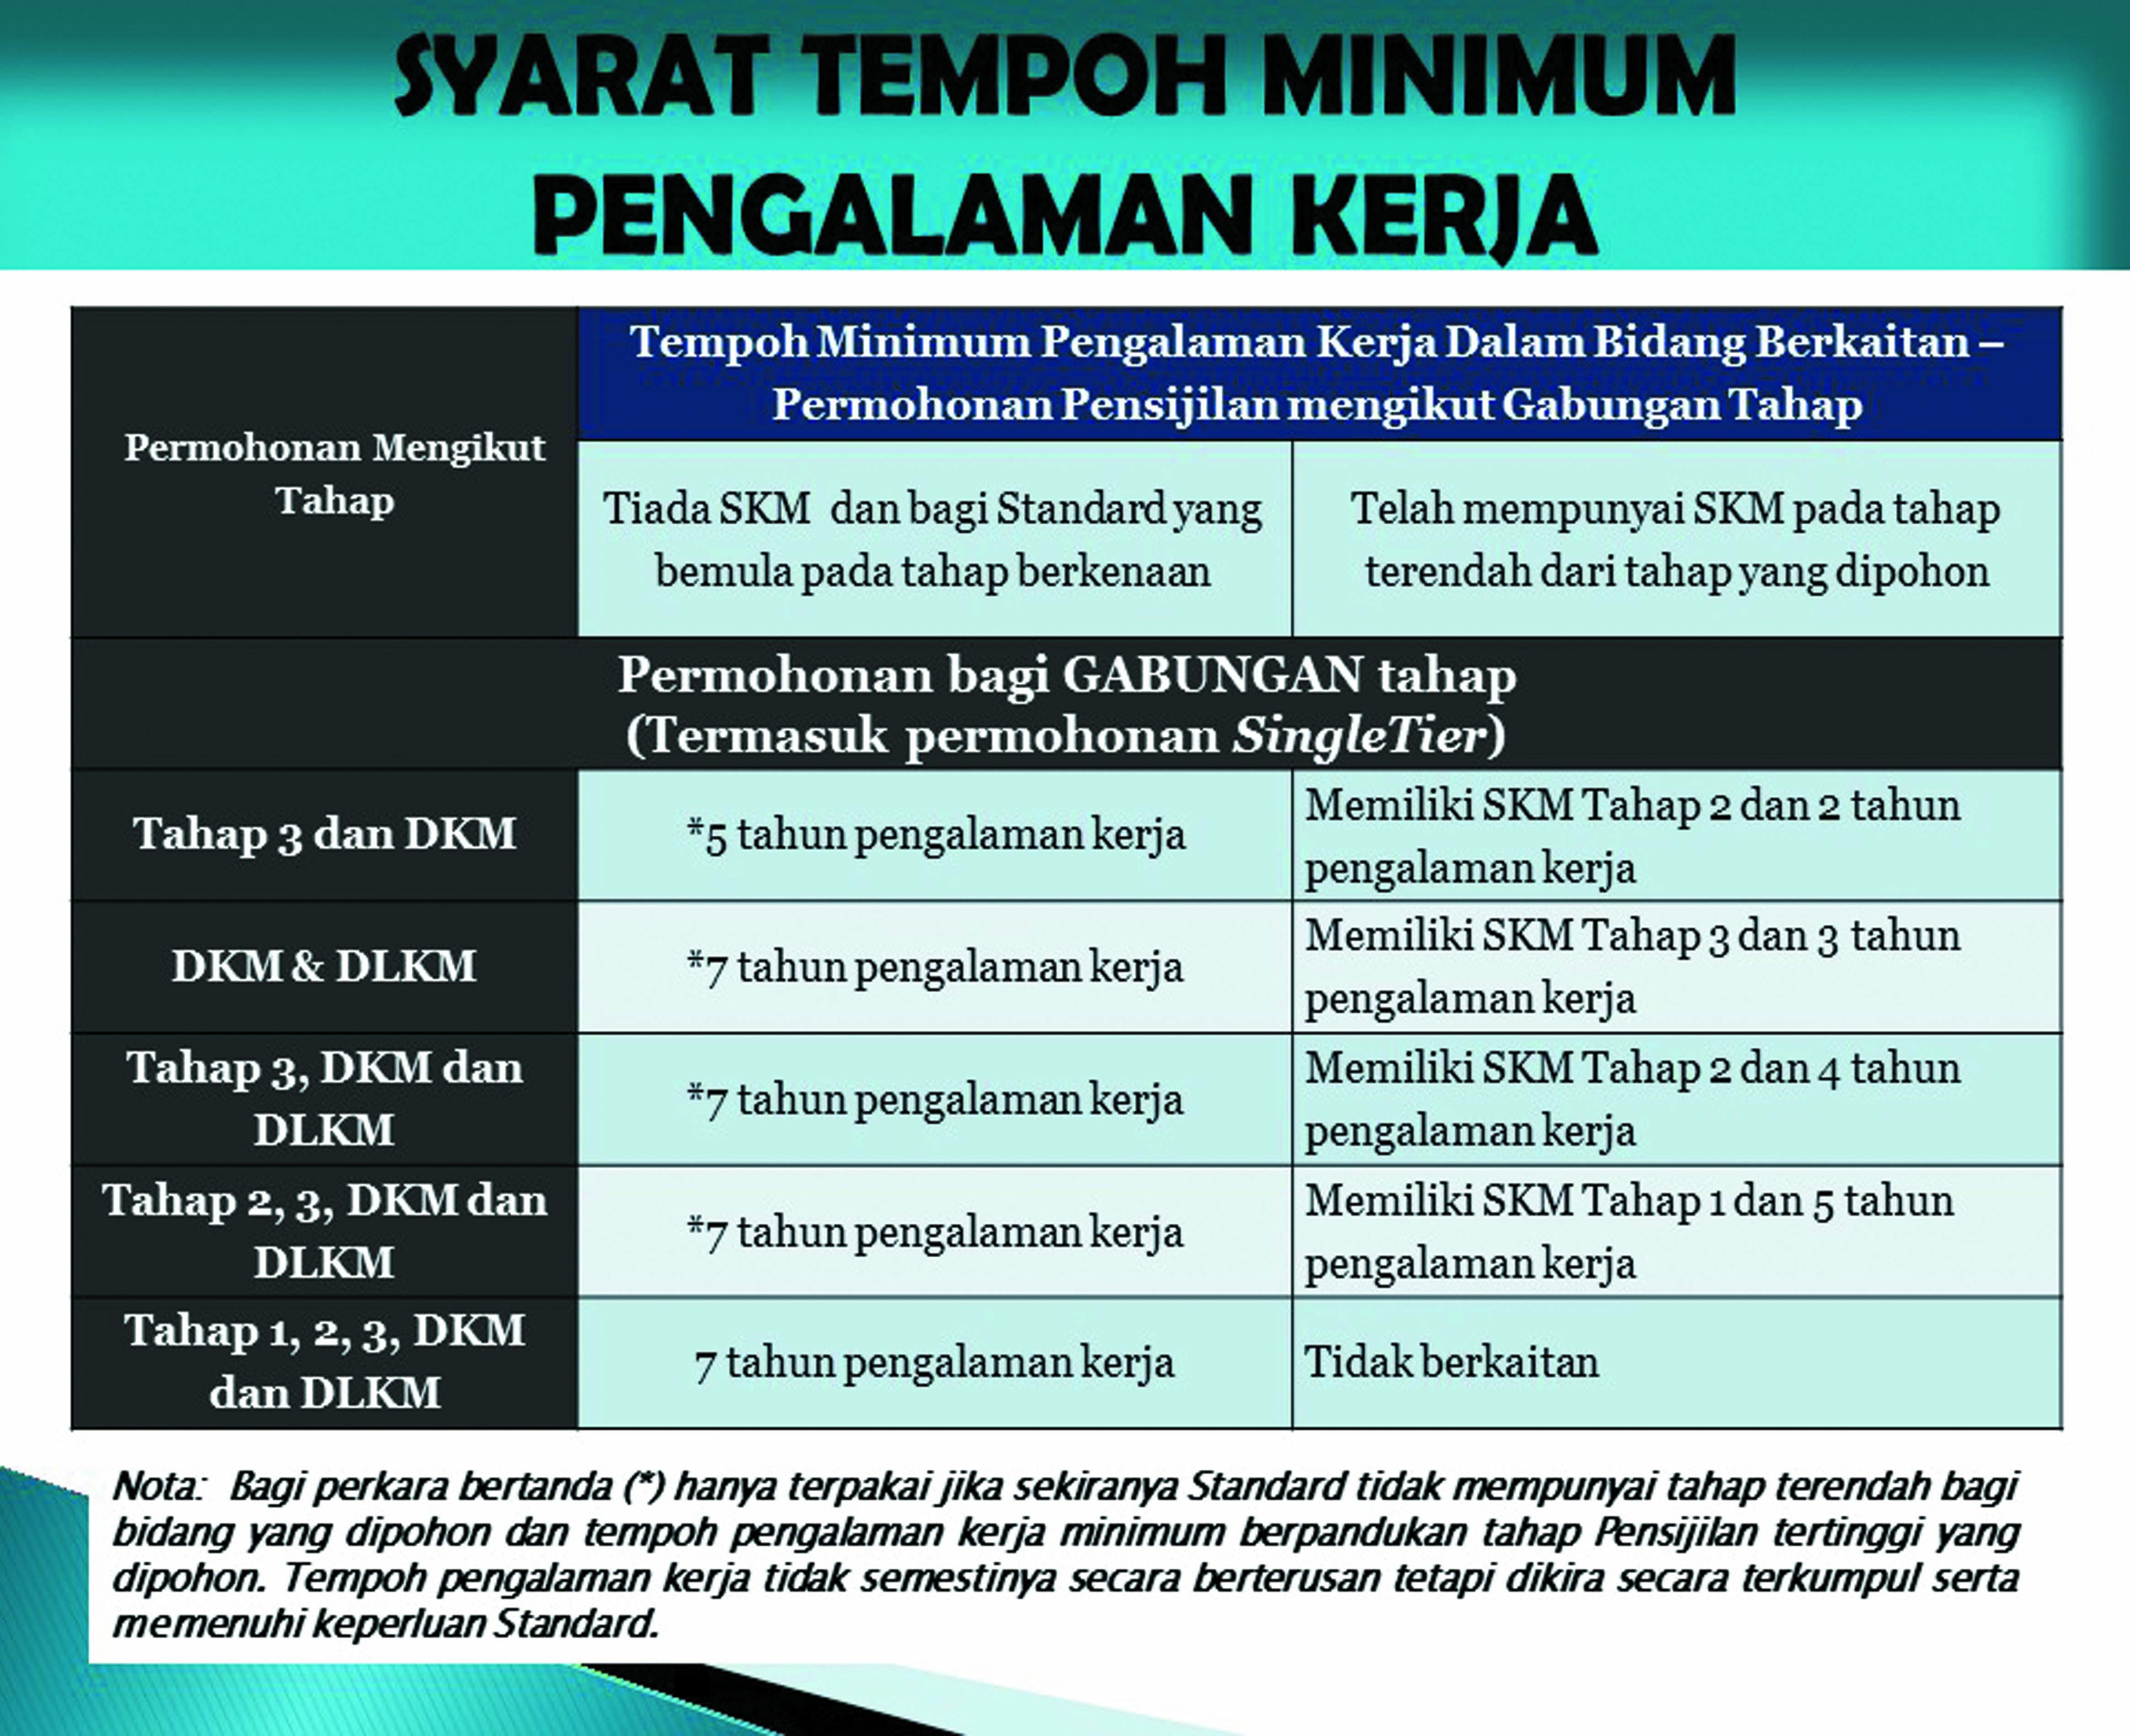 3_syarat_minimum_ppt.jpg